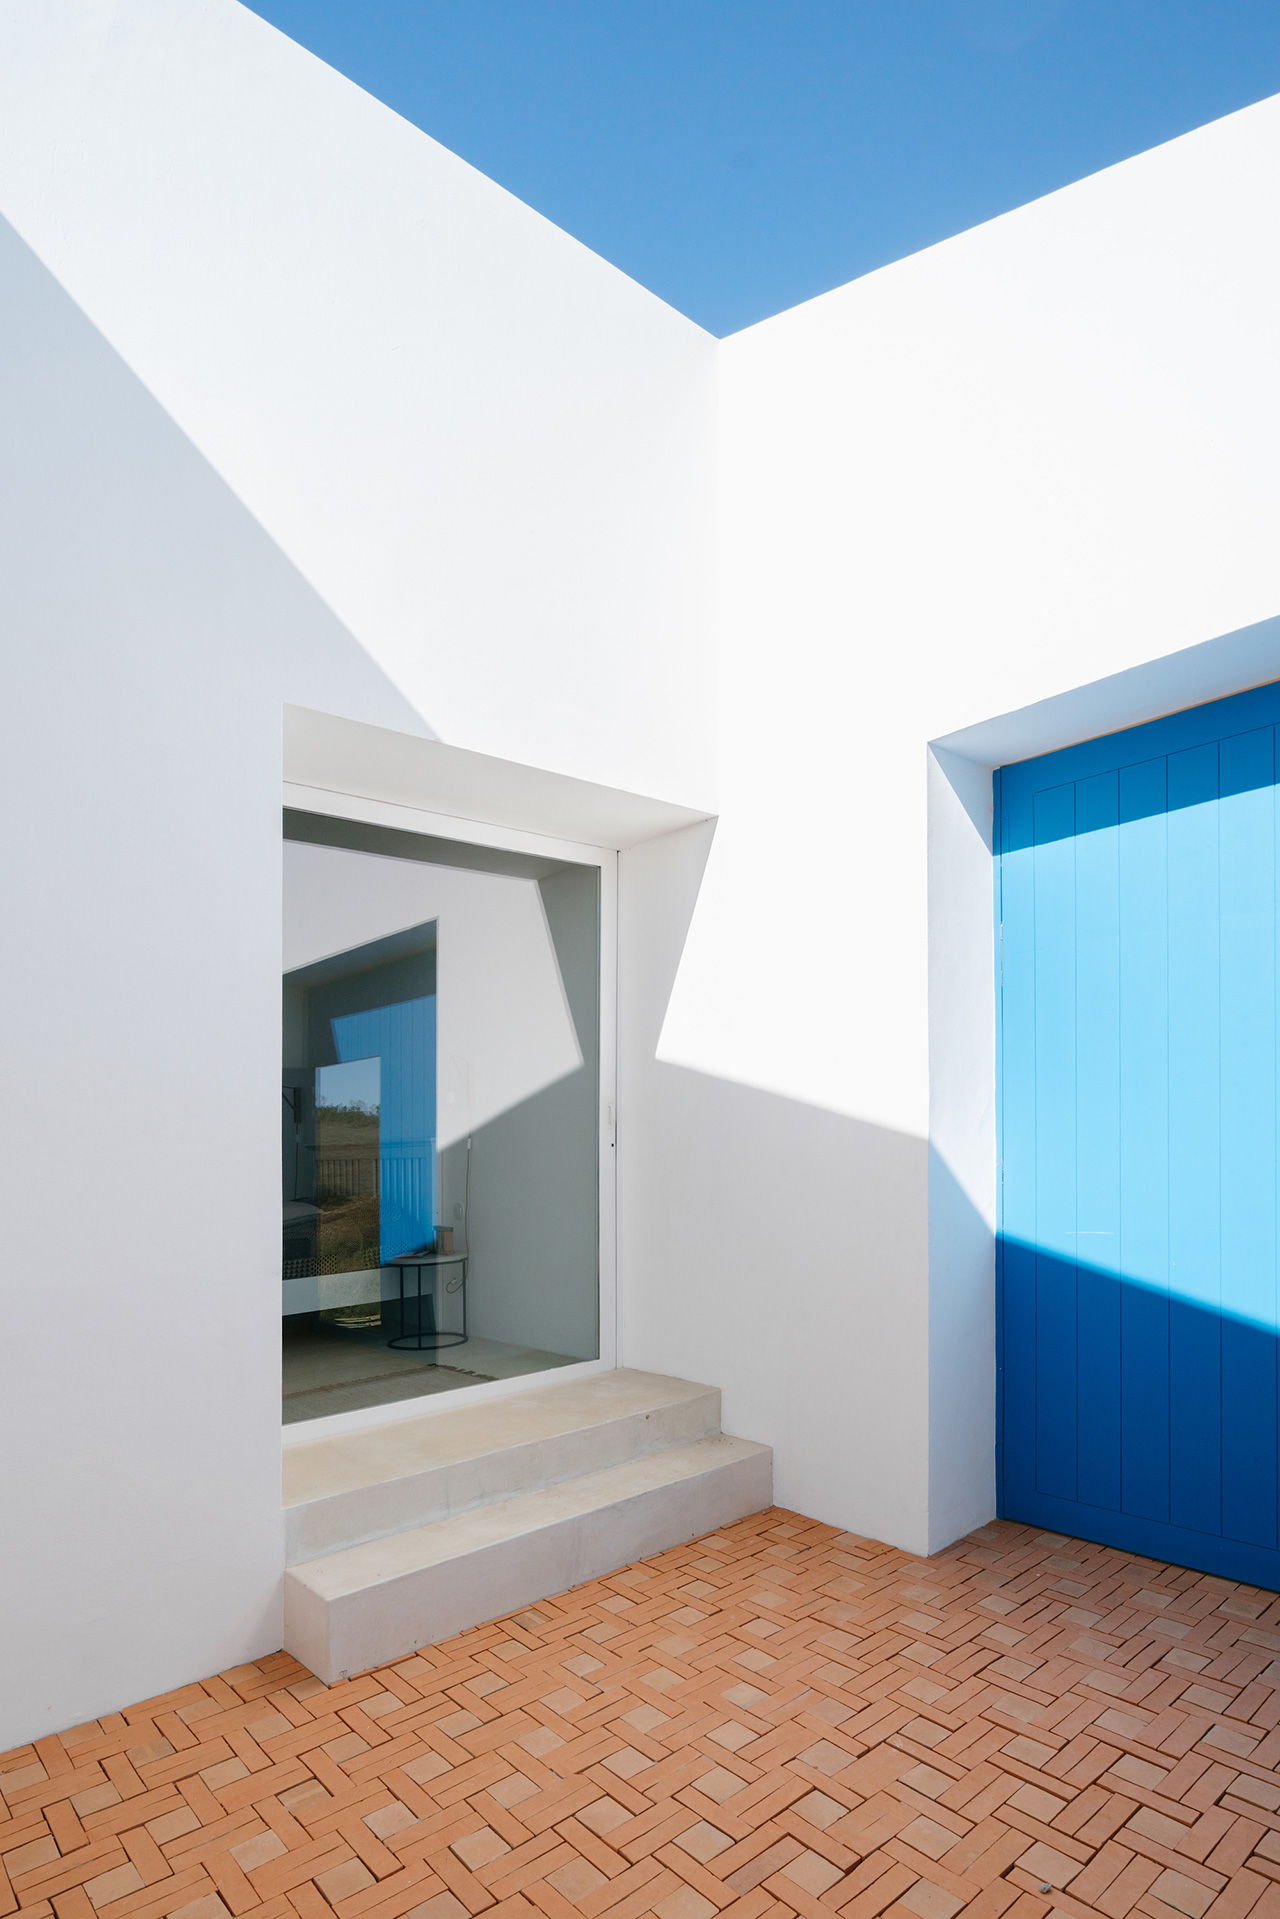 White walls contrast agains the Alentejo Blue walls.